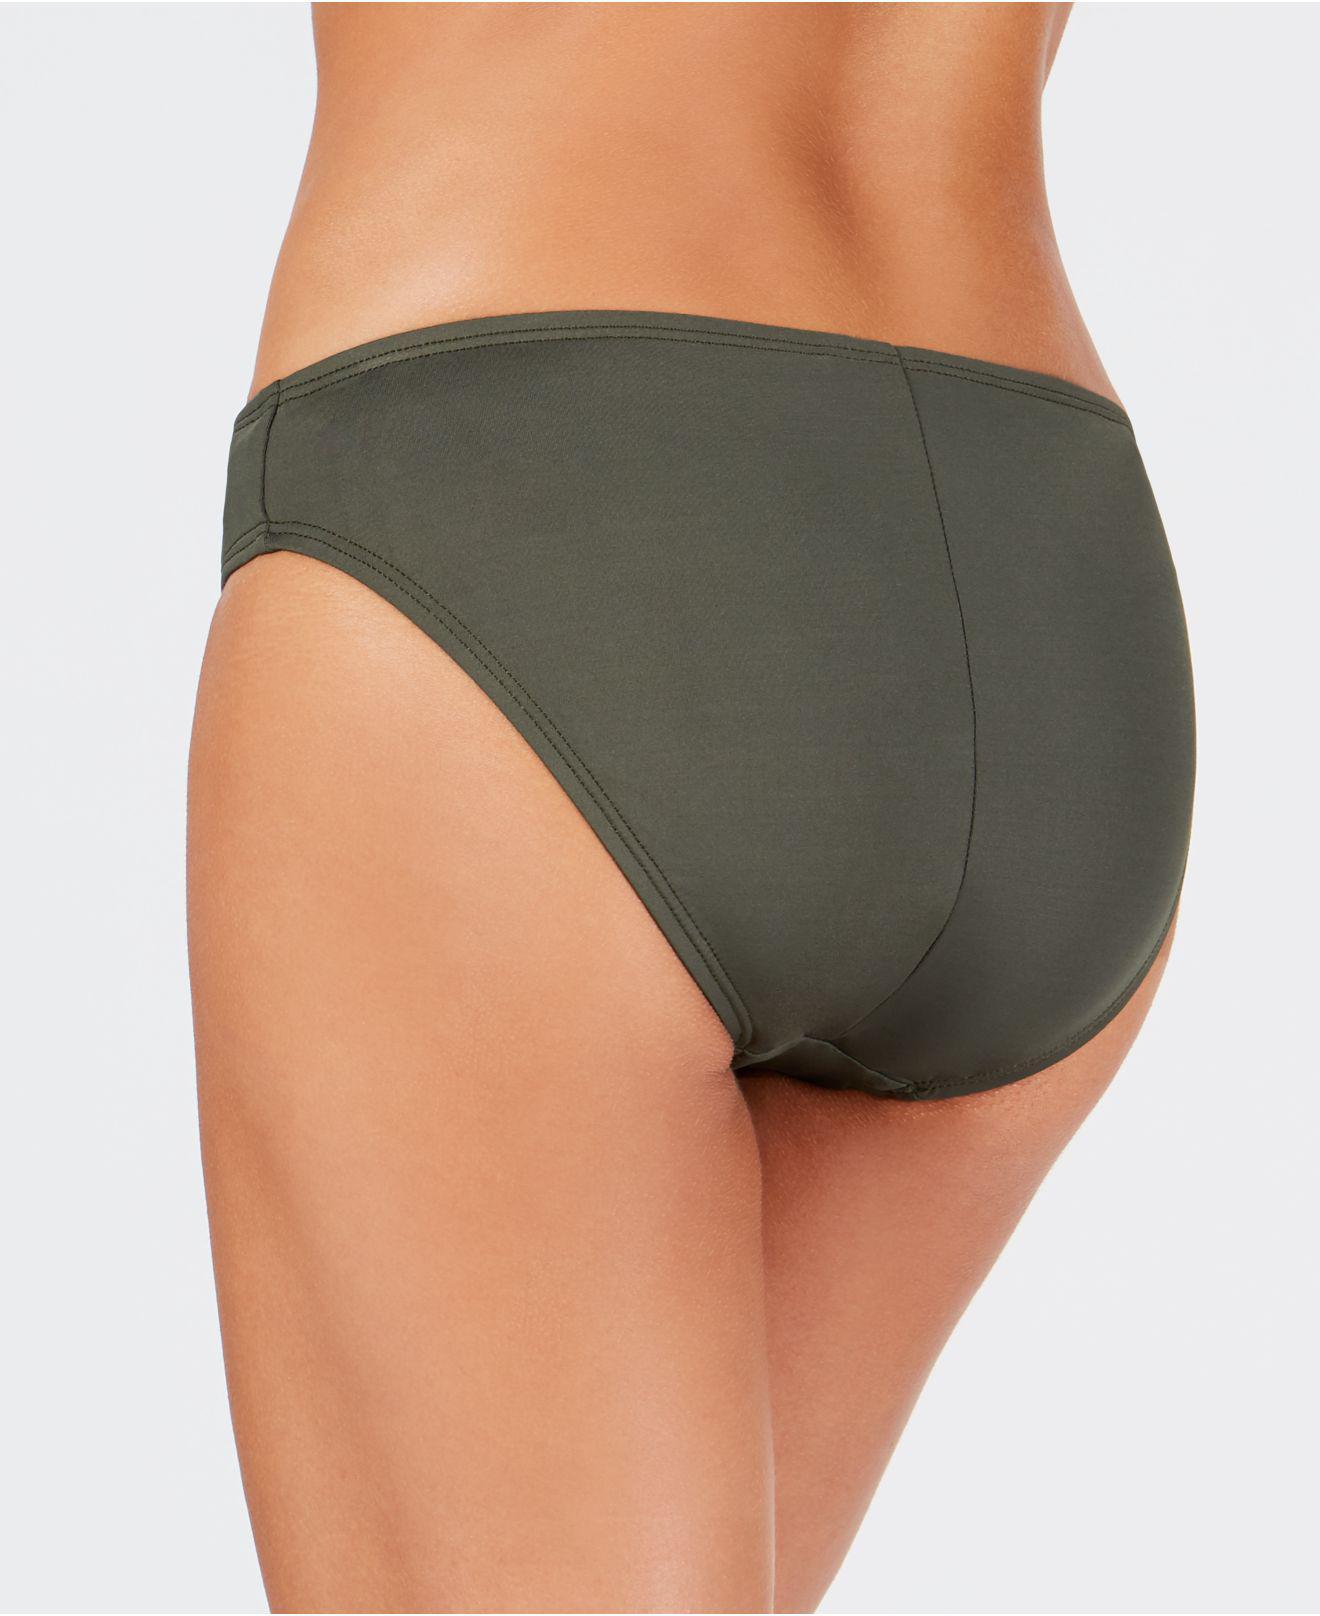 d8ce261aa0837 Lyst - La Blanca Classic Bikini Bottoms in Green